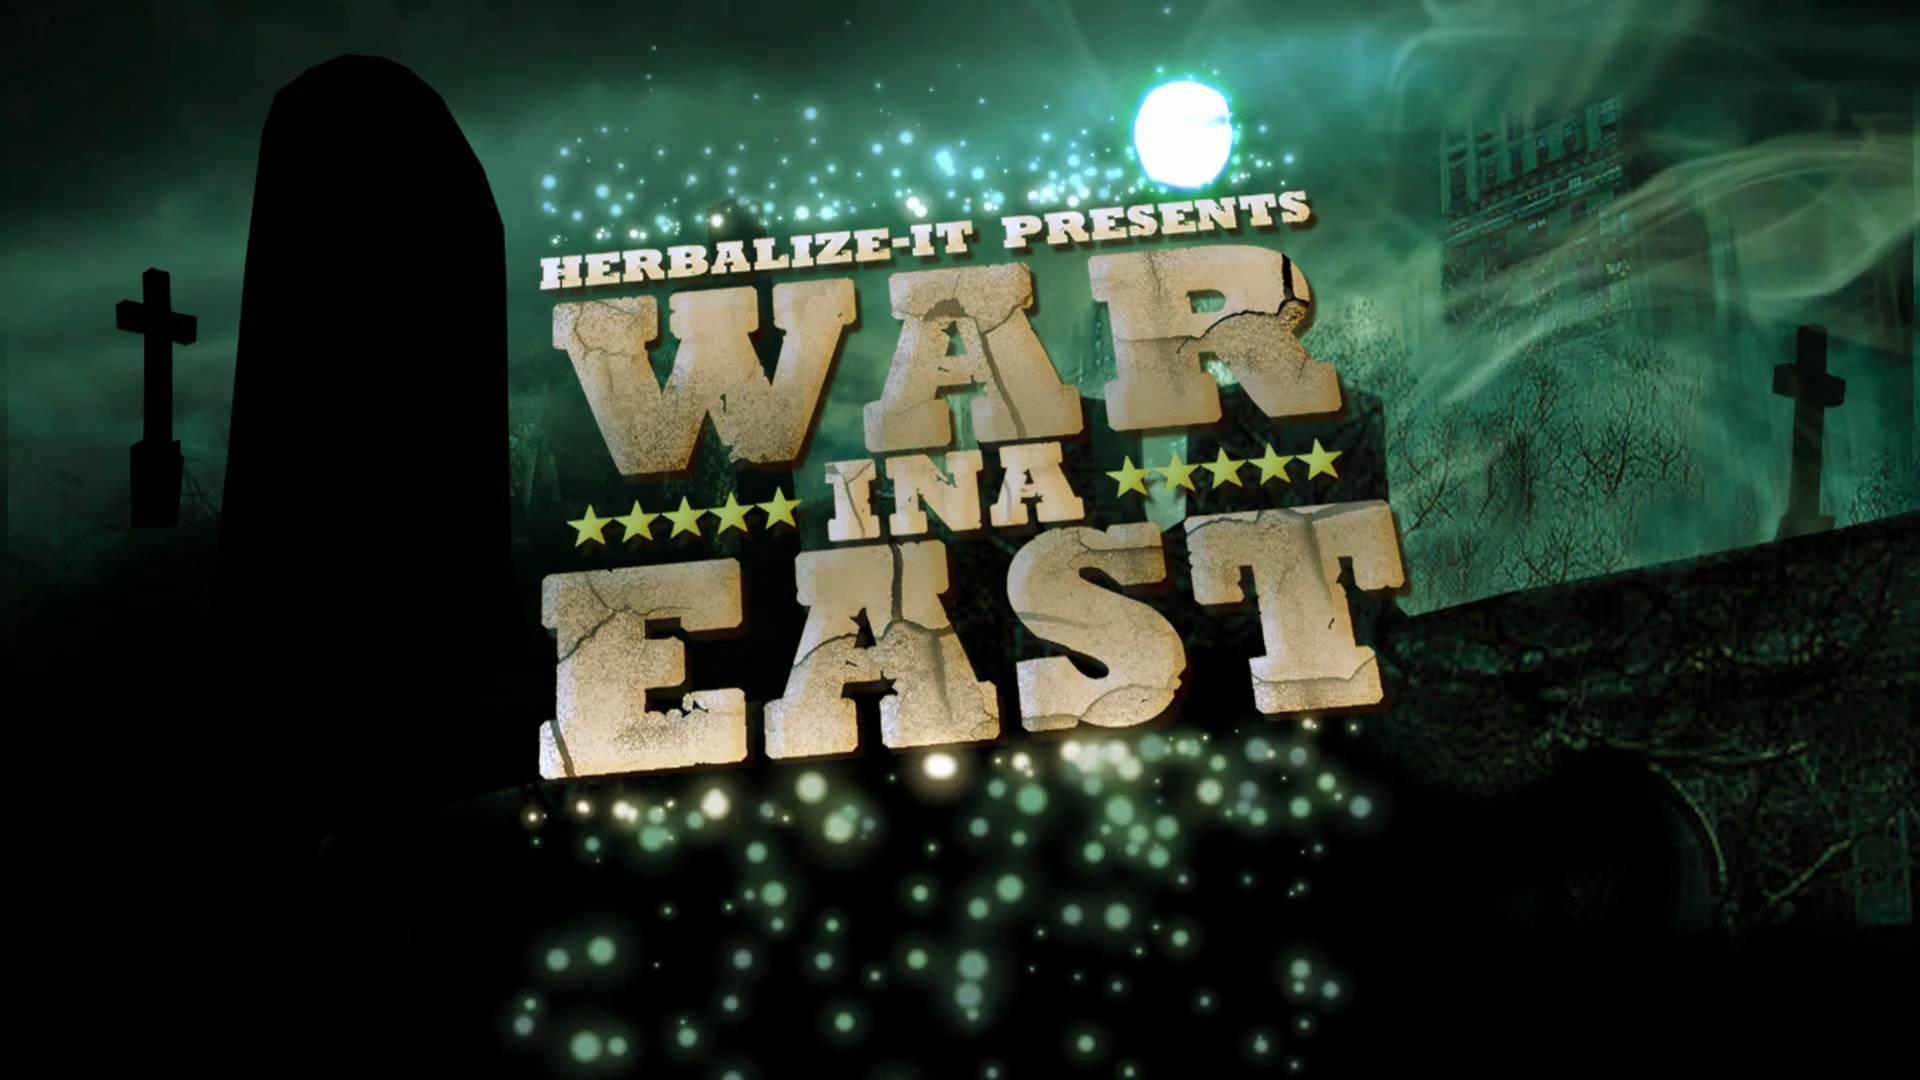 Promo-Trailer: War Ina East 2011 [3/9/2011]